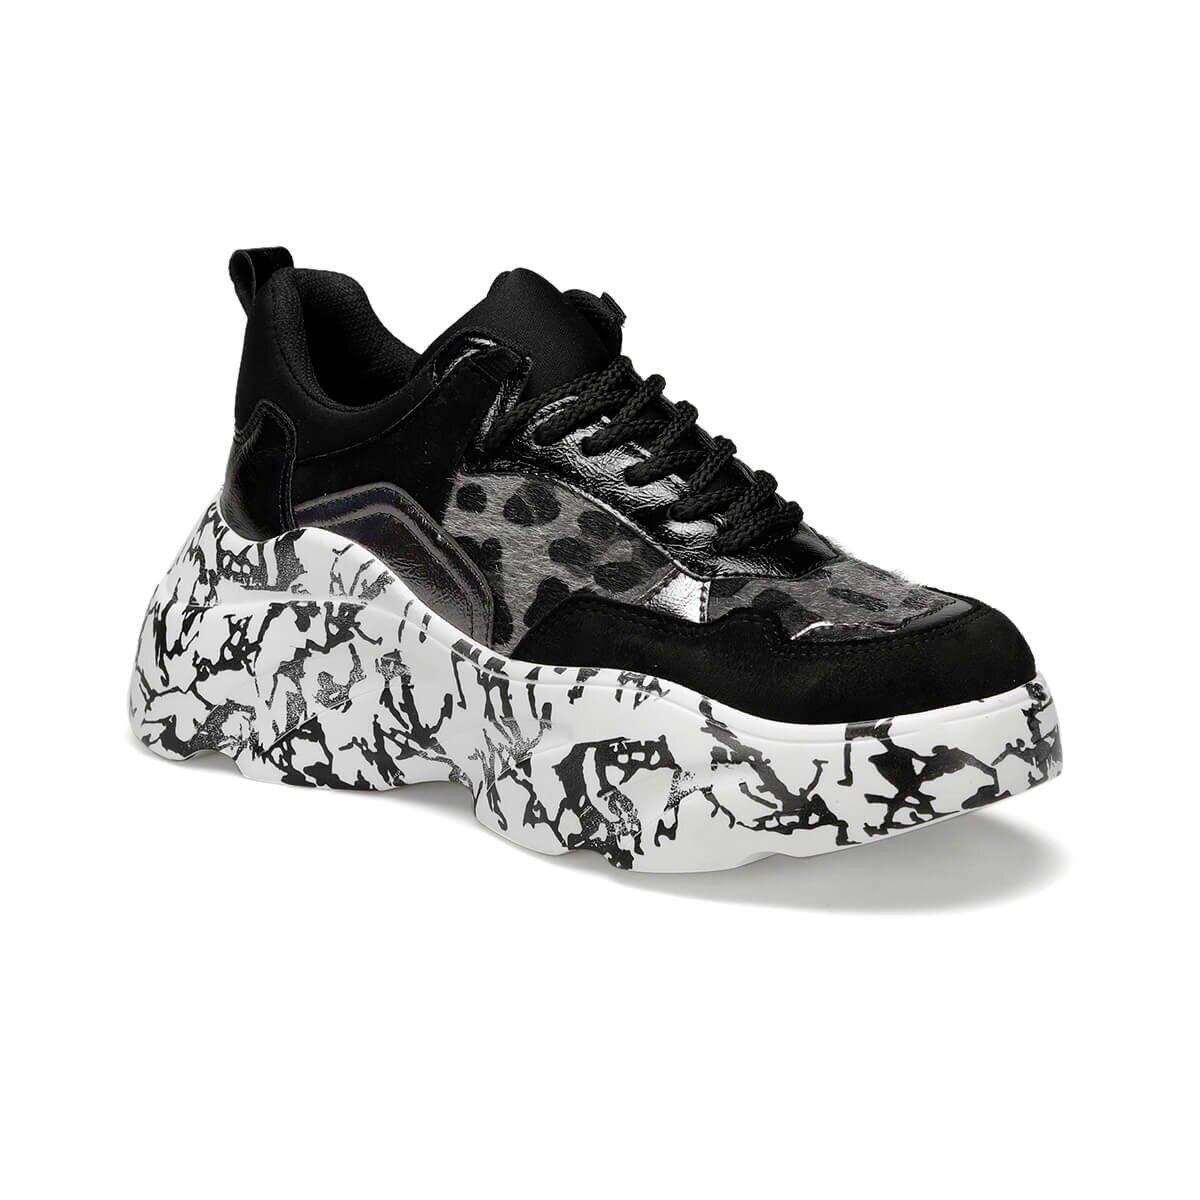 FLO MALIBU Black Women 'S Sneaker Shoes BUTIGO